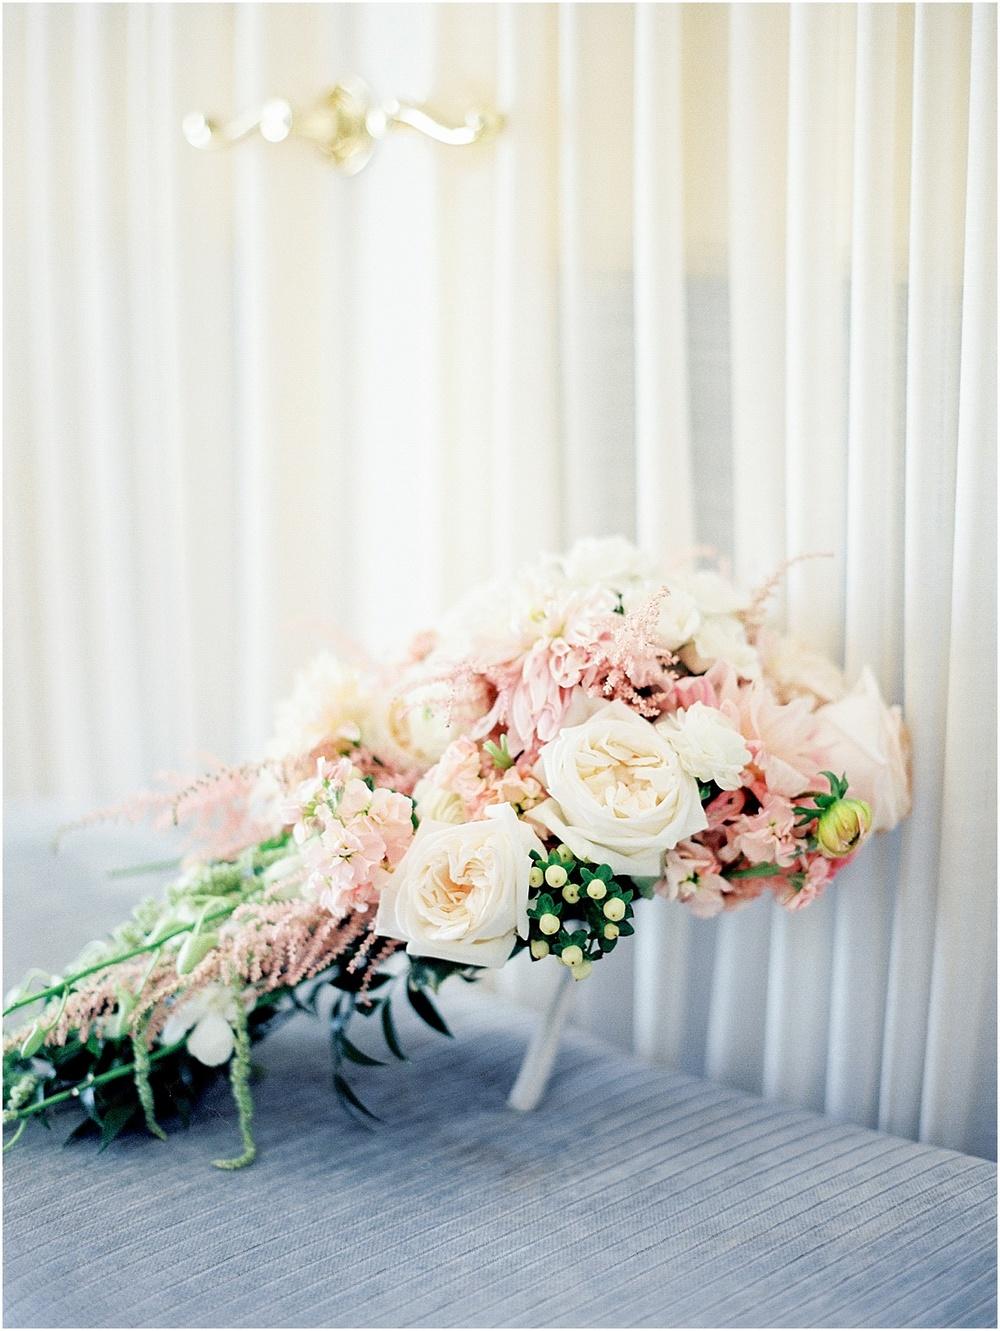 St_Louis_Wedding_Fine_Art_Film_Photographer_Jordan_Brittley_(www.jordanbrittley.com)_0006.jpg